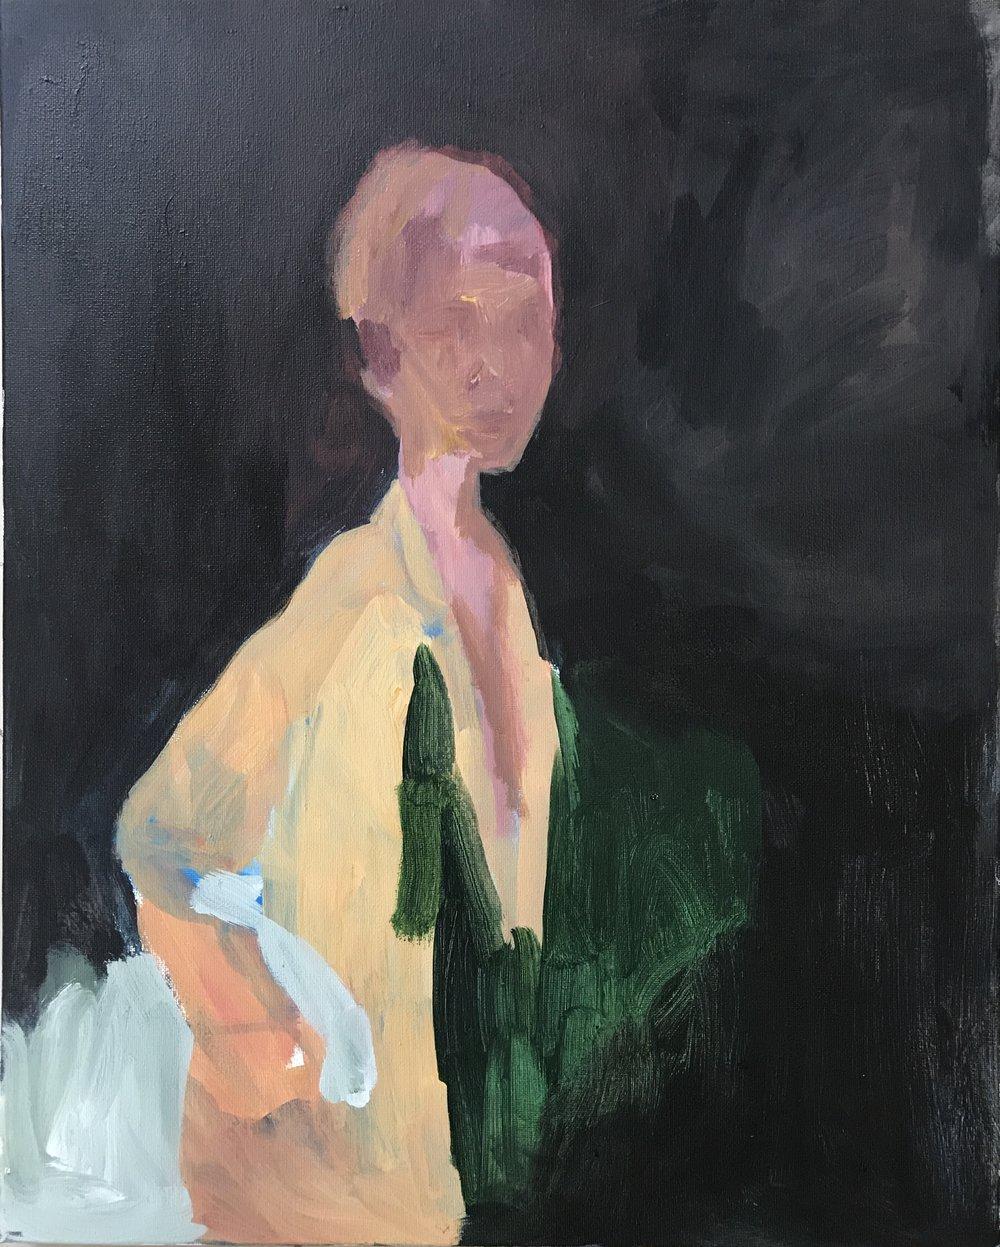 RA01711-A_AbrugenaRinne_Portrait of a girl_Acrylic on canvas_50 x 40 cm_2017.JPG